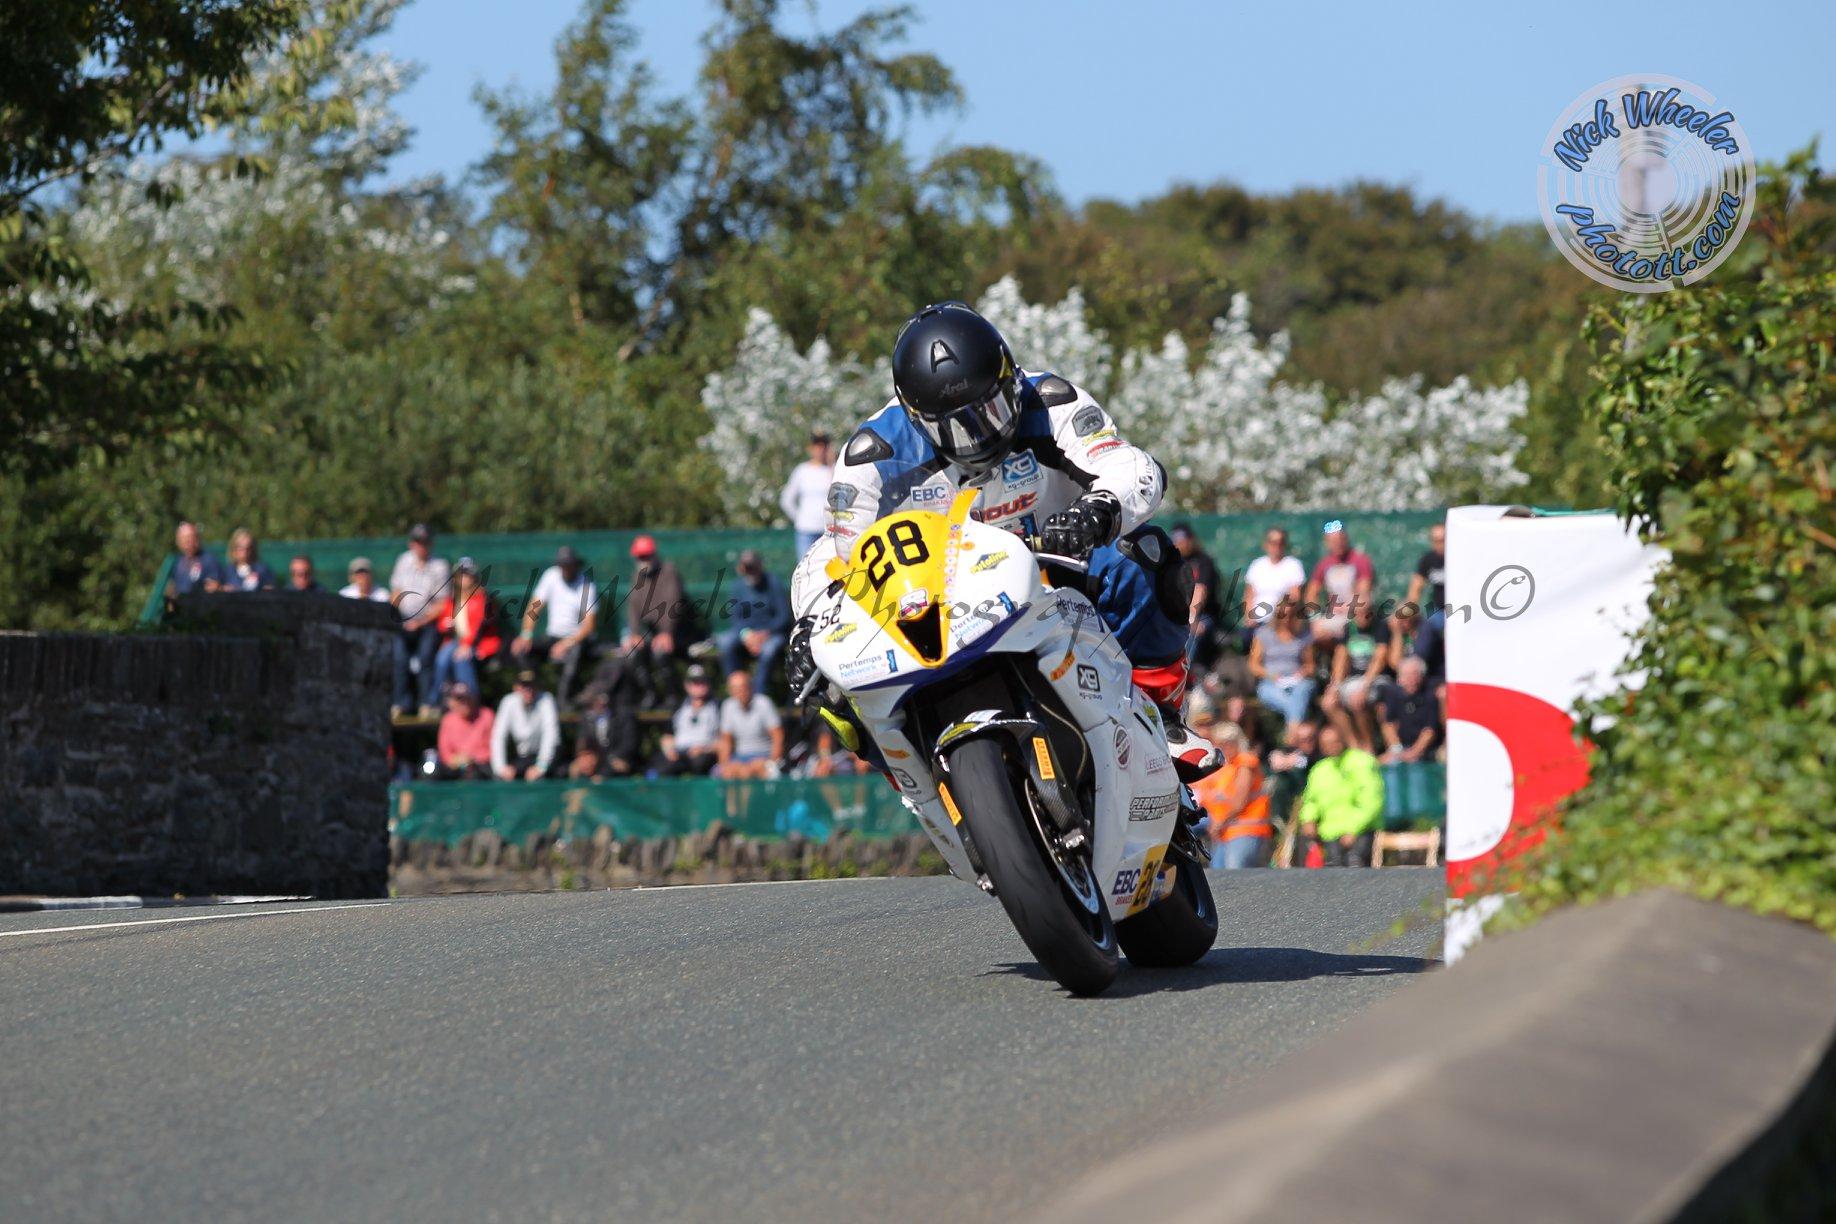 Manx GP Top 6: Gaz Evans